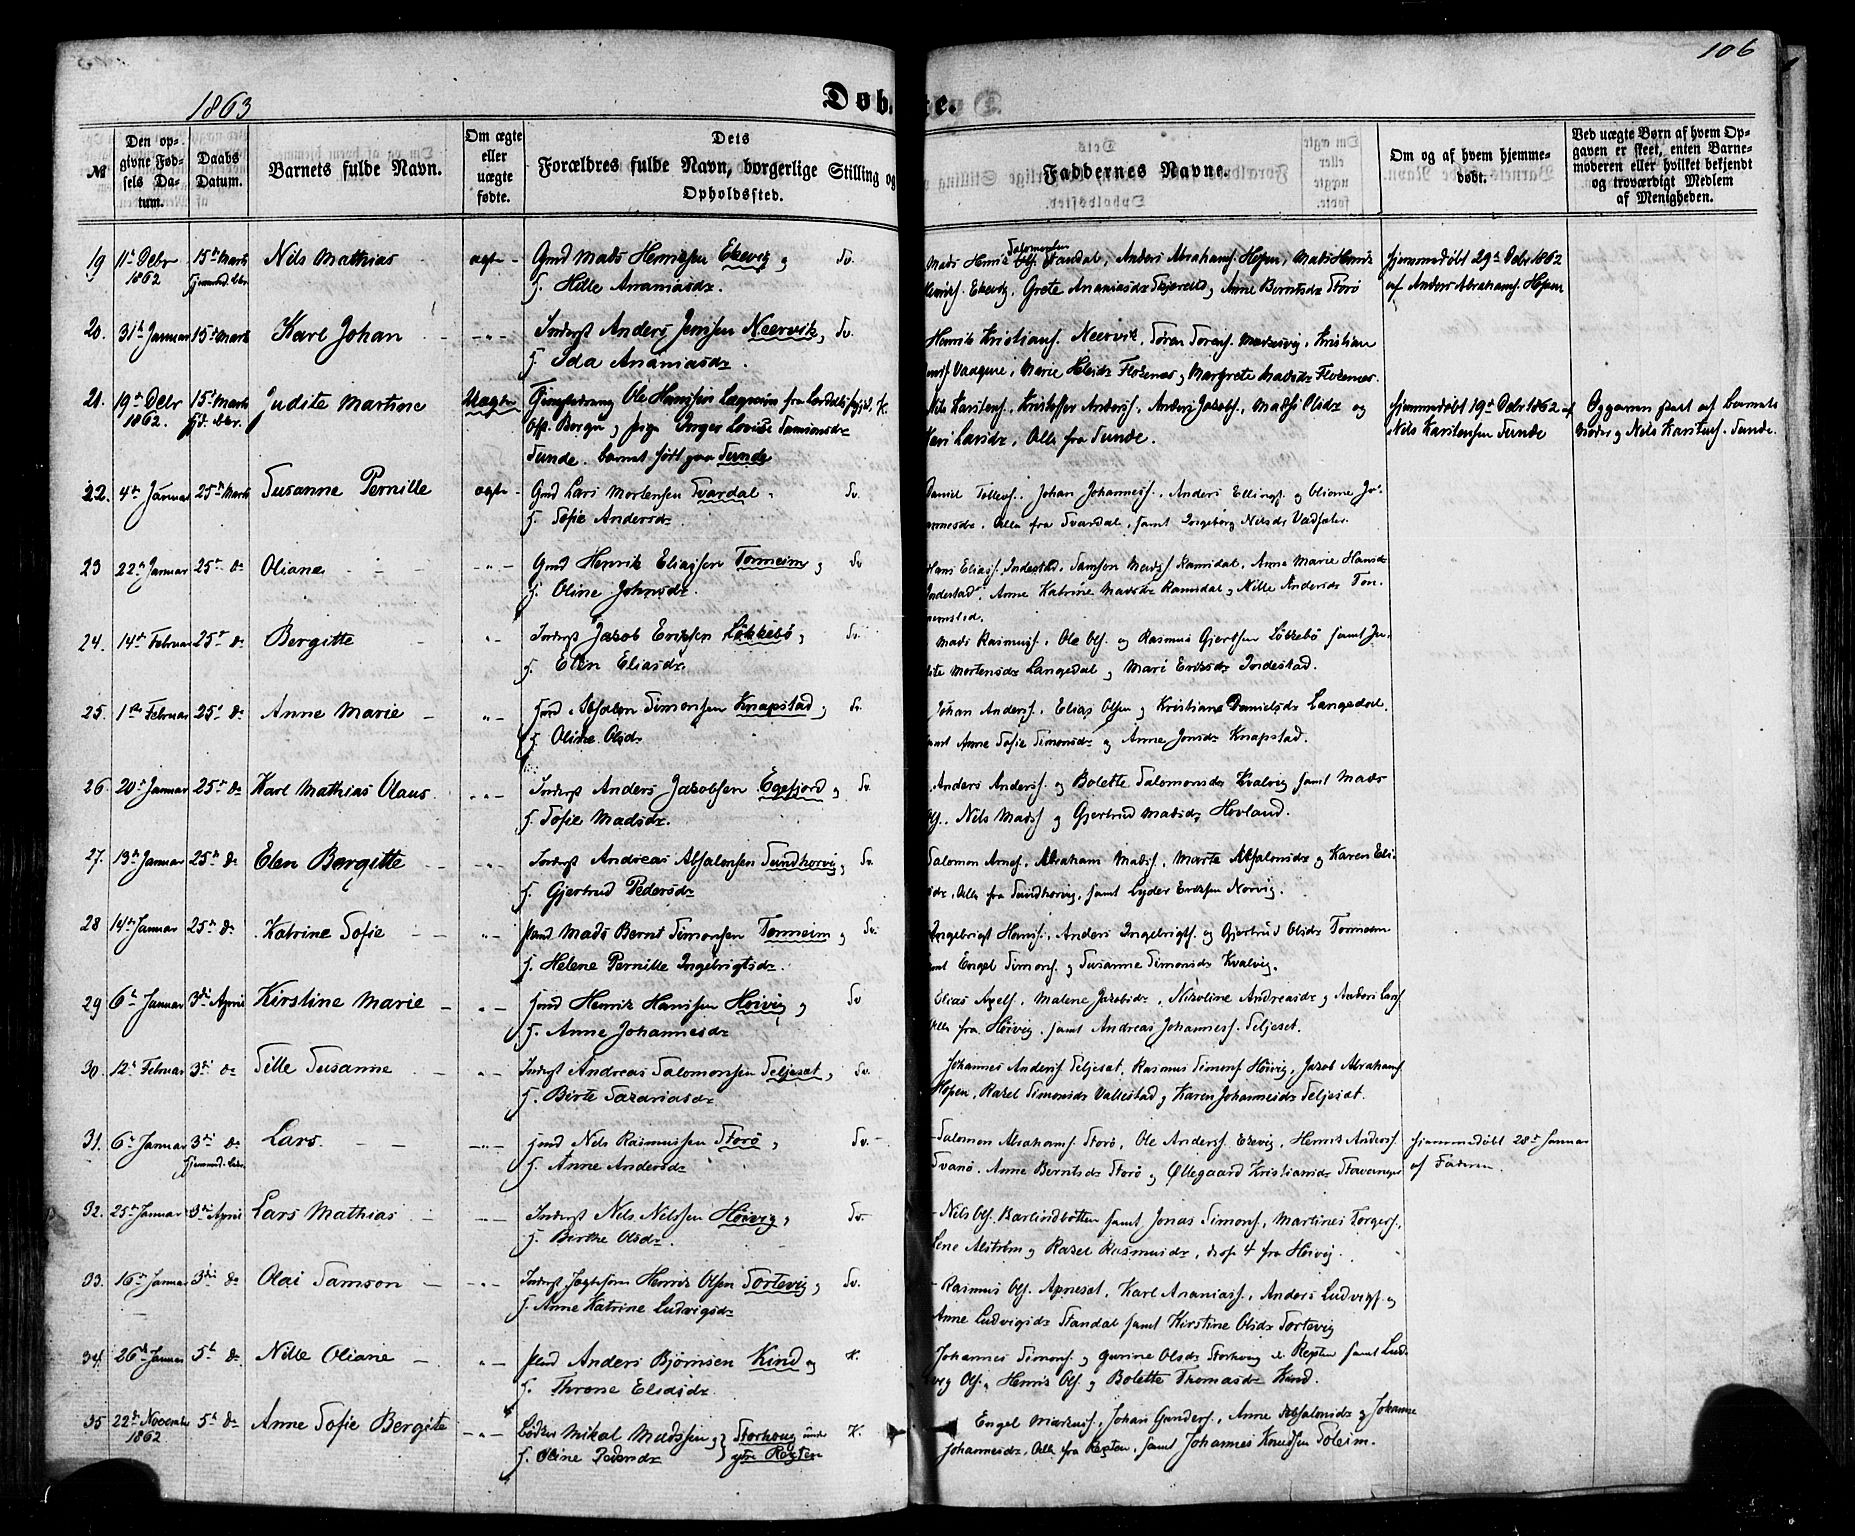 SAB, Kinn sokneprestembete, H/Haa/Haaa/L0006: Ministerialbok nr. A 6, 1857-1885, s. 106